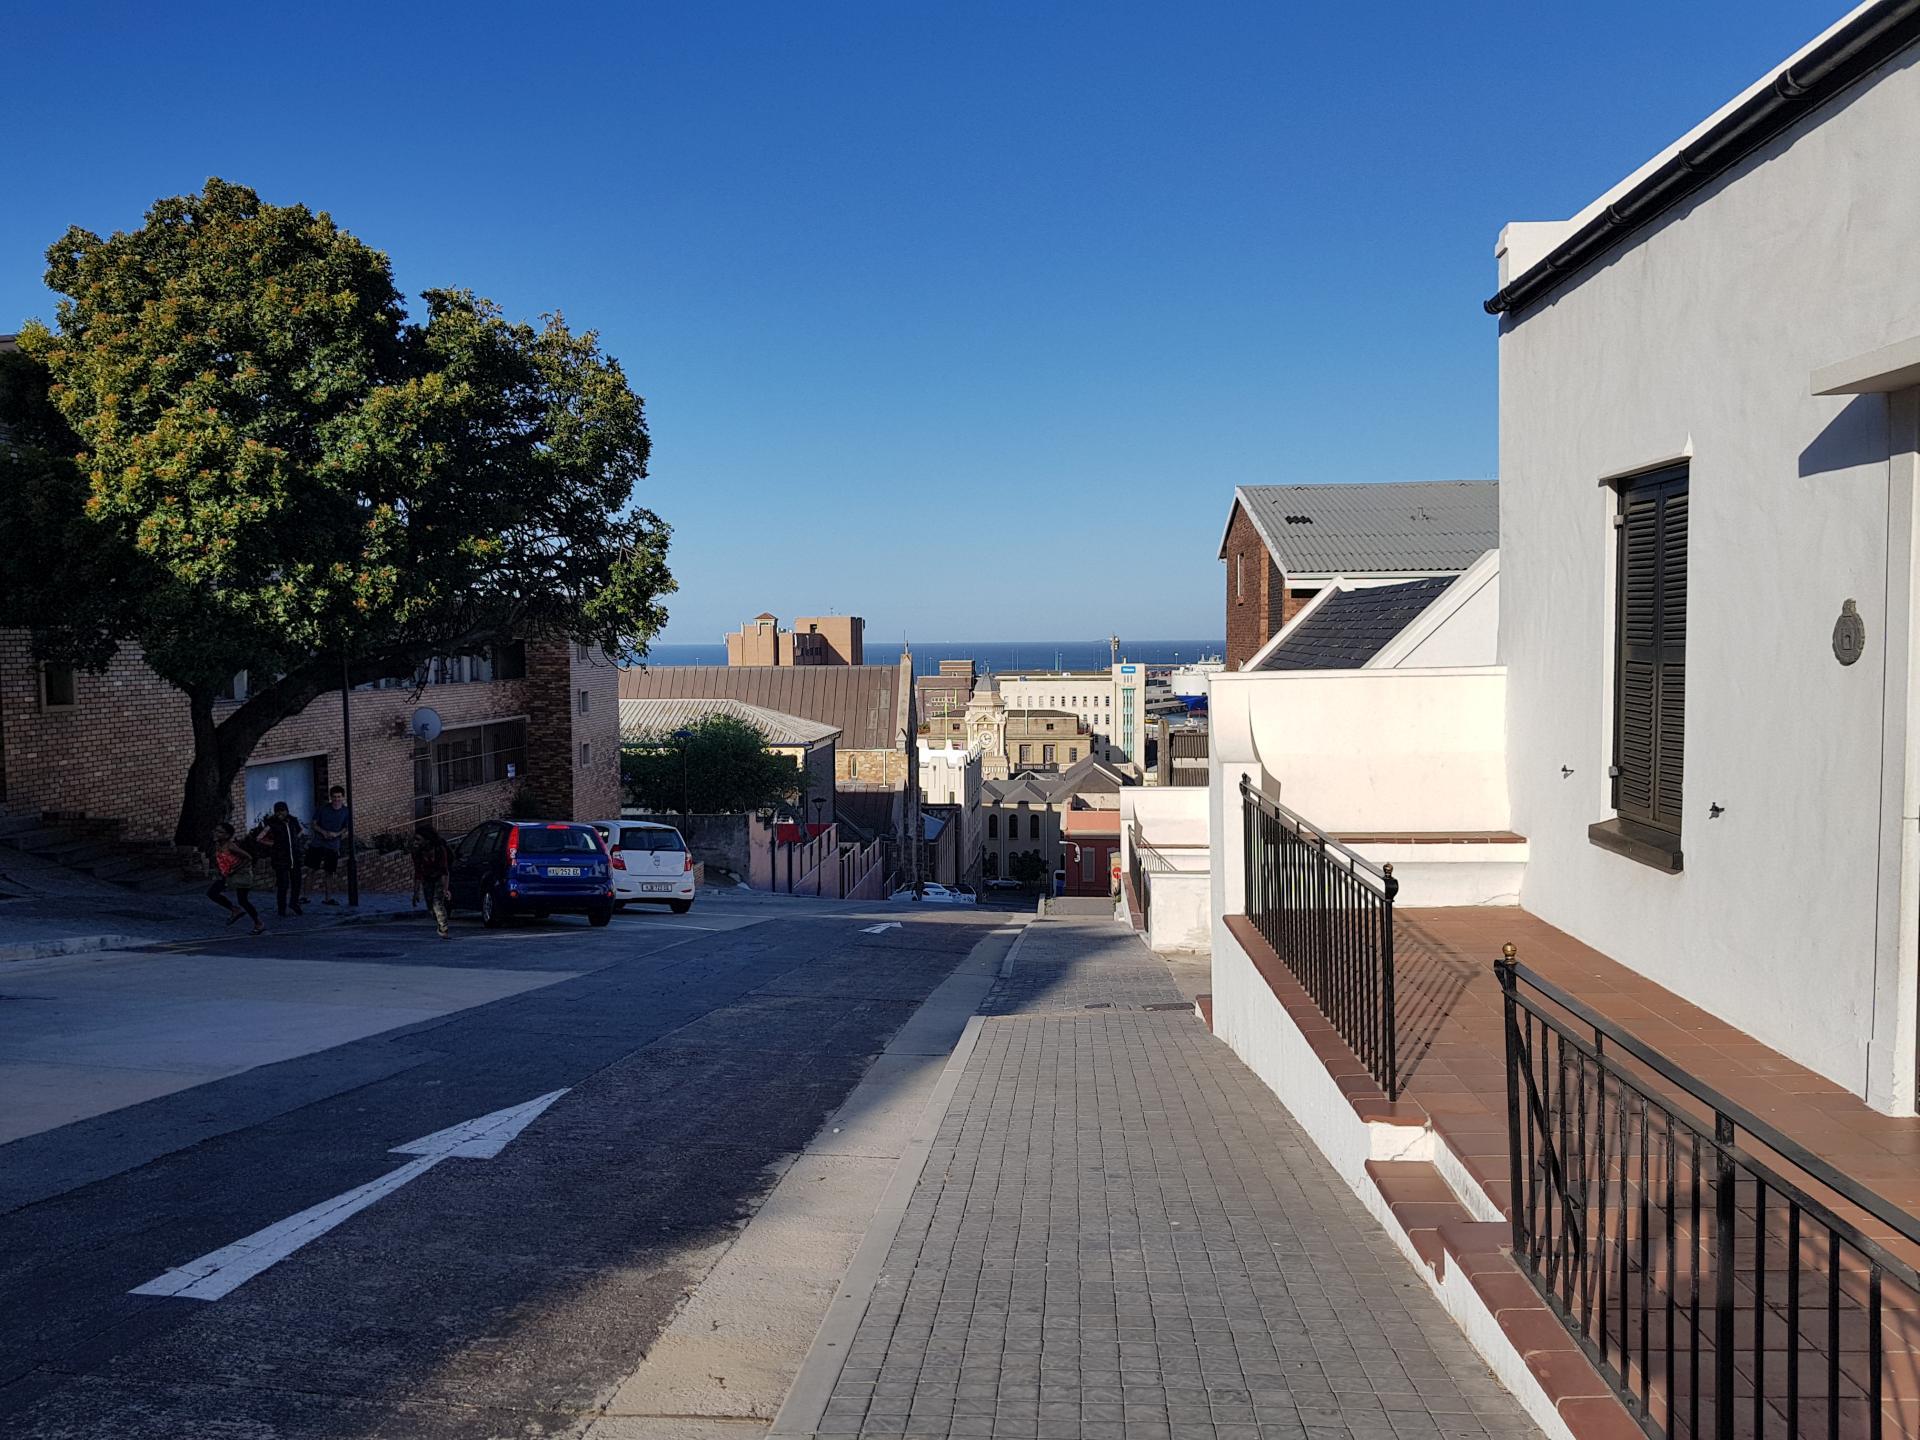 улицы Порт-Элизабет